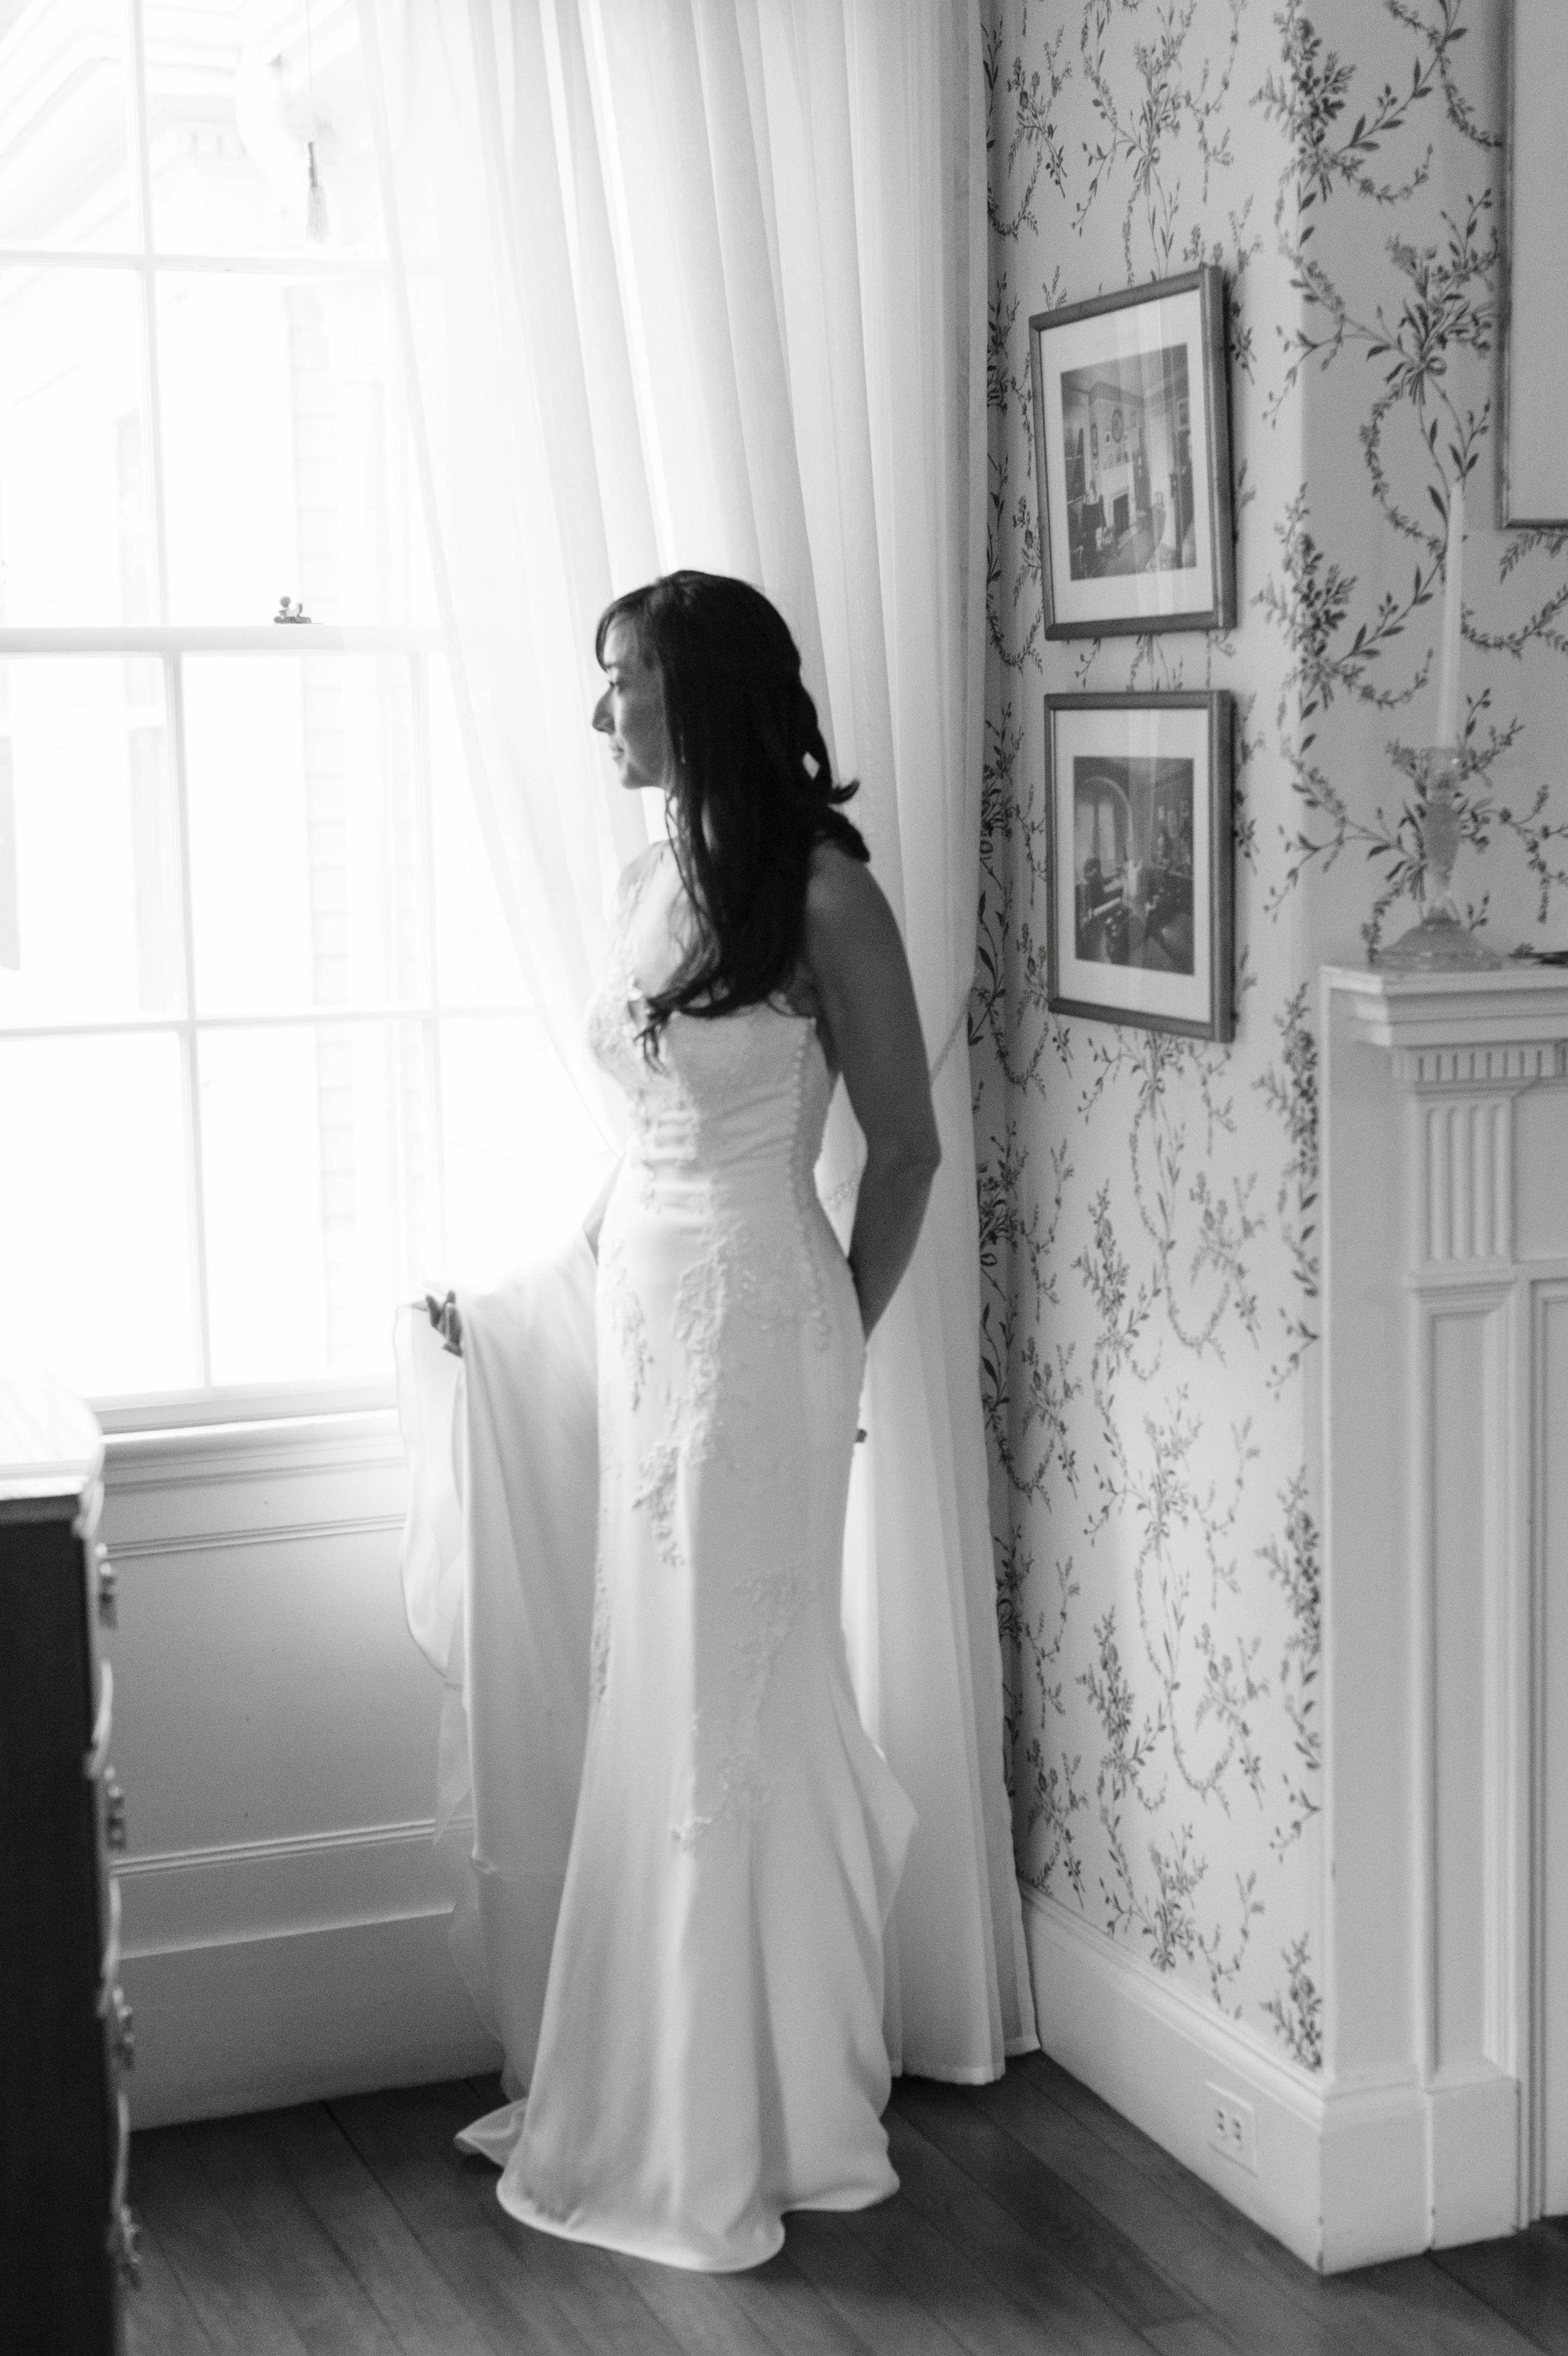 Creative-Wedding-Photography-Boston05.jpg